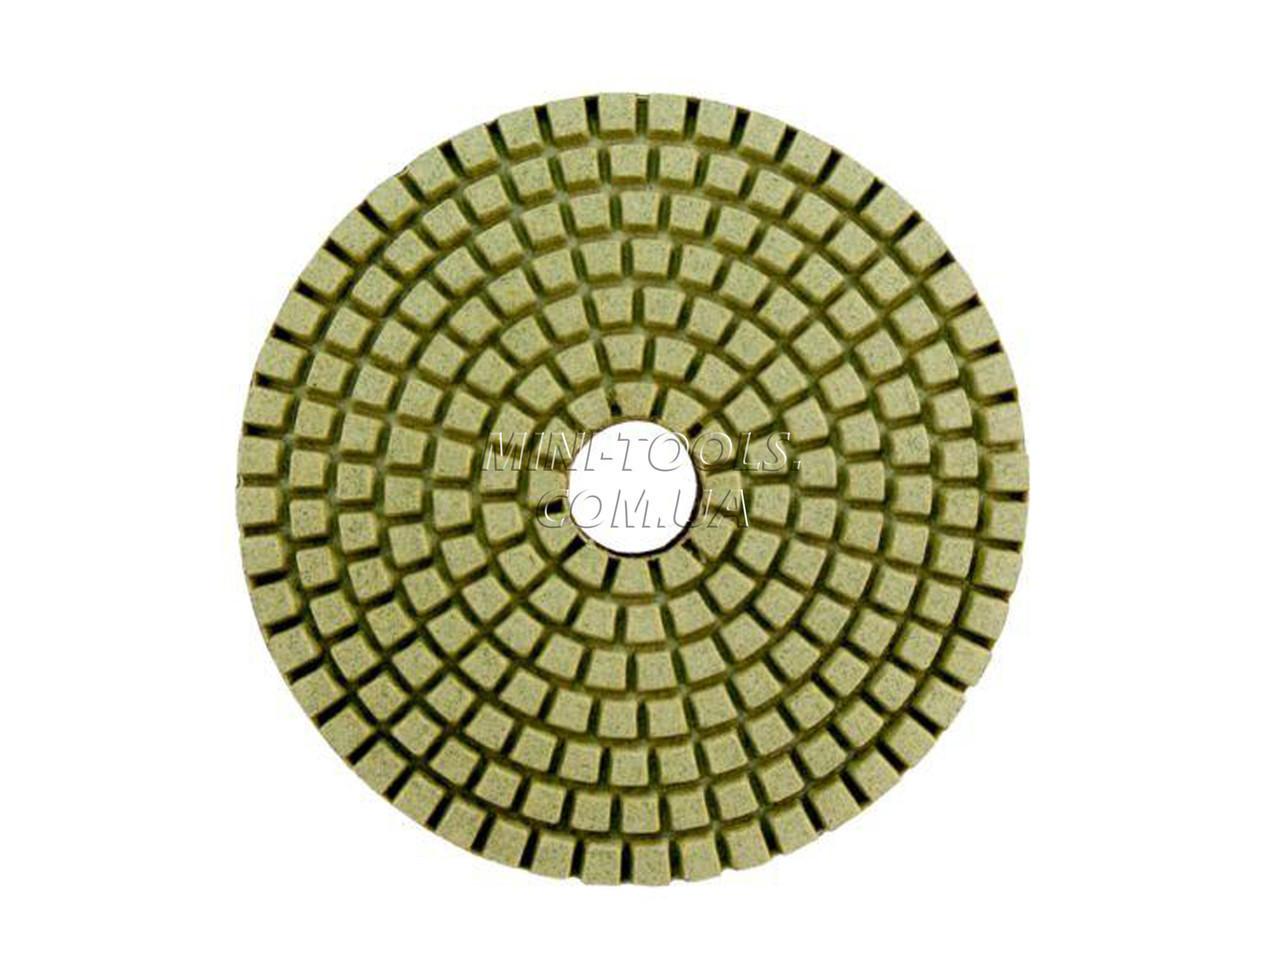 Черепашка D-125мм. зерно #600. Алмазний гнучкий шліфувальний круг YDS Tools